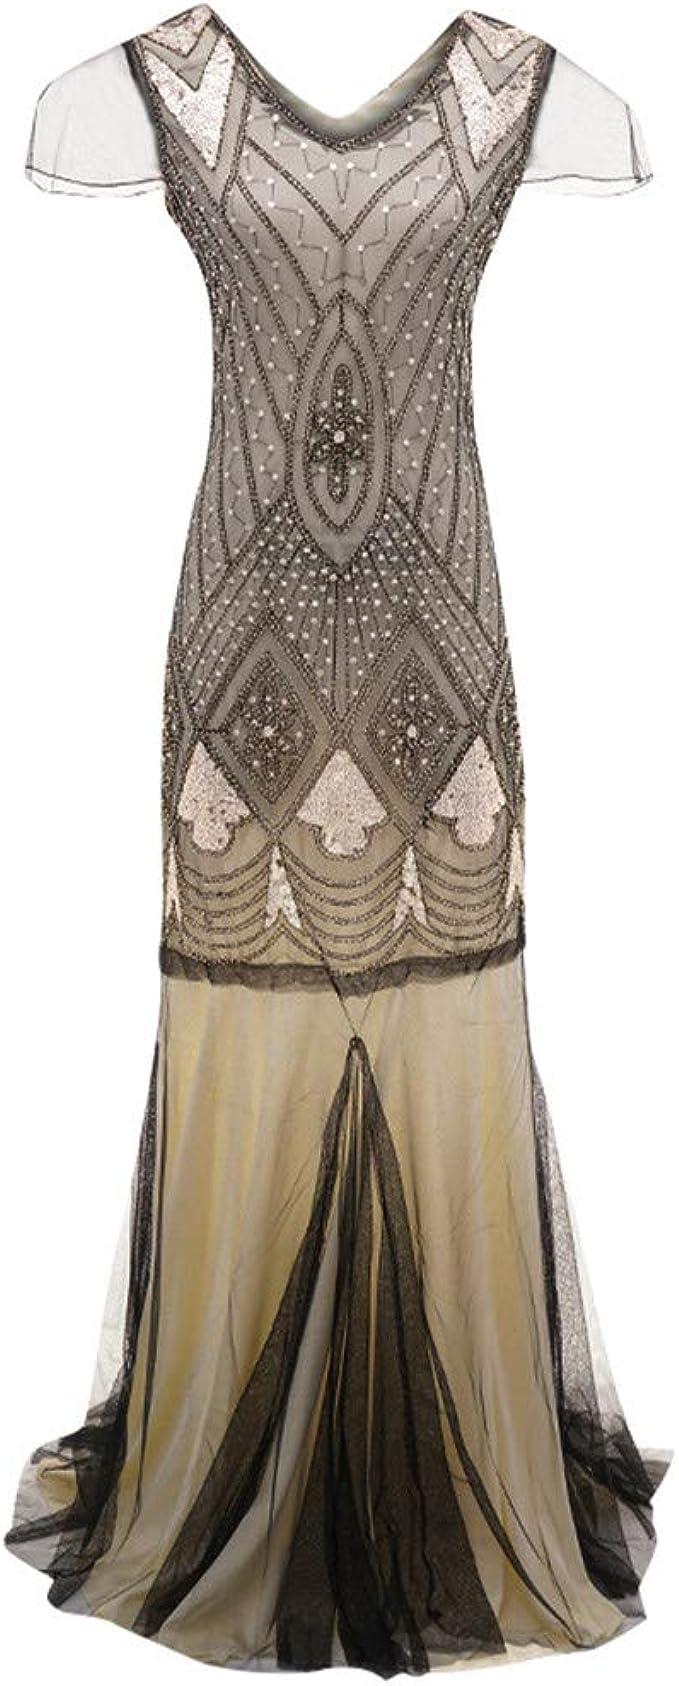 AmyGline Lange Kleider Damen Maxikleid 12er Vintage Inspirierte